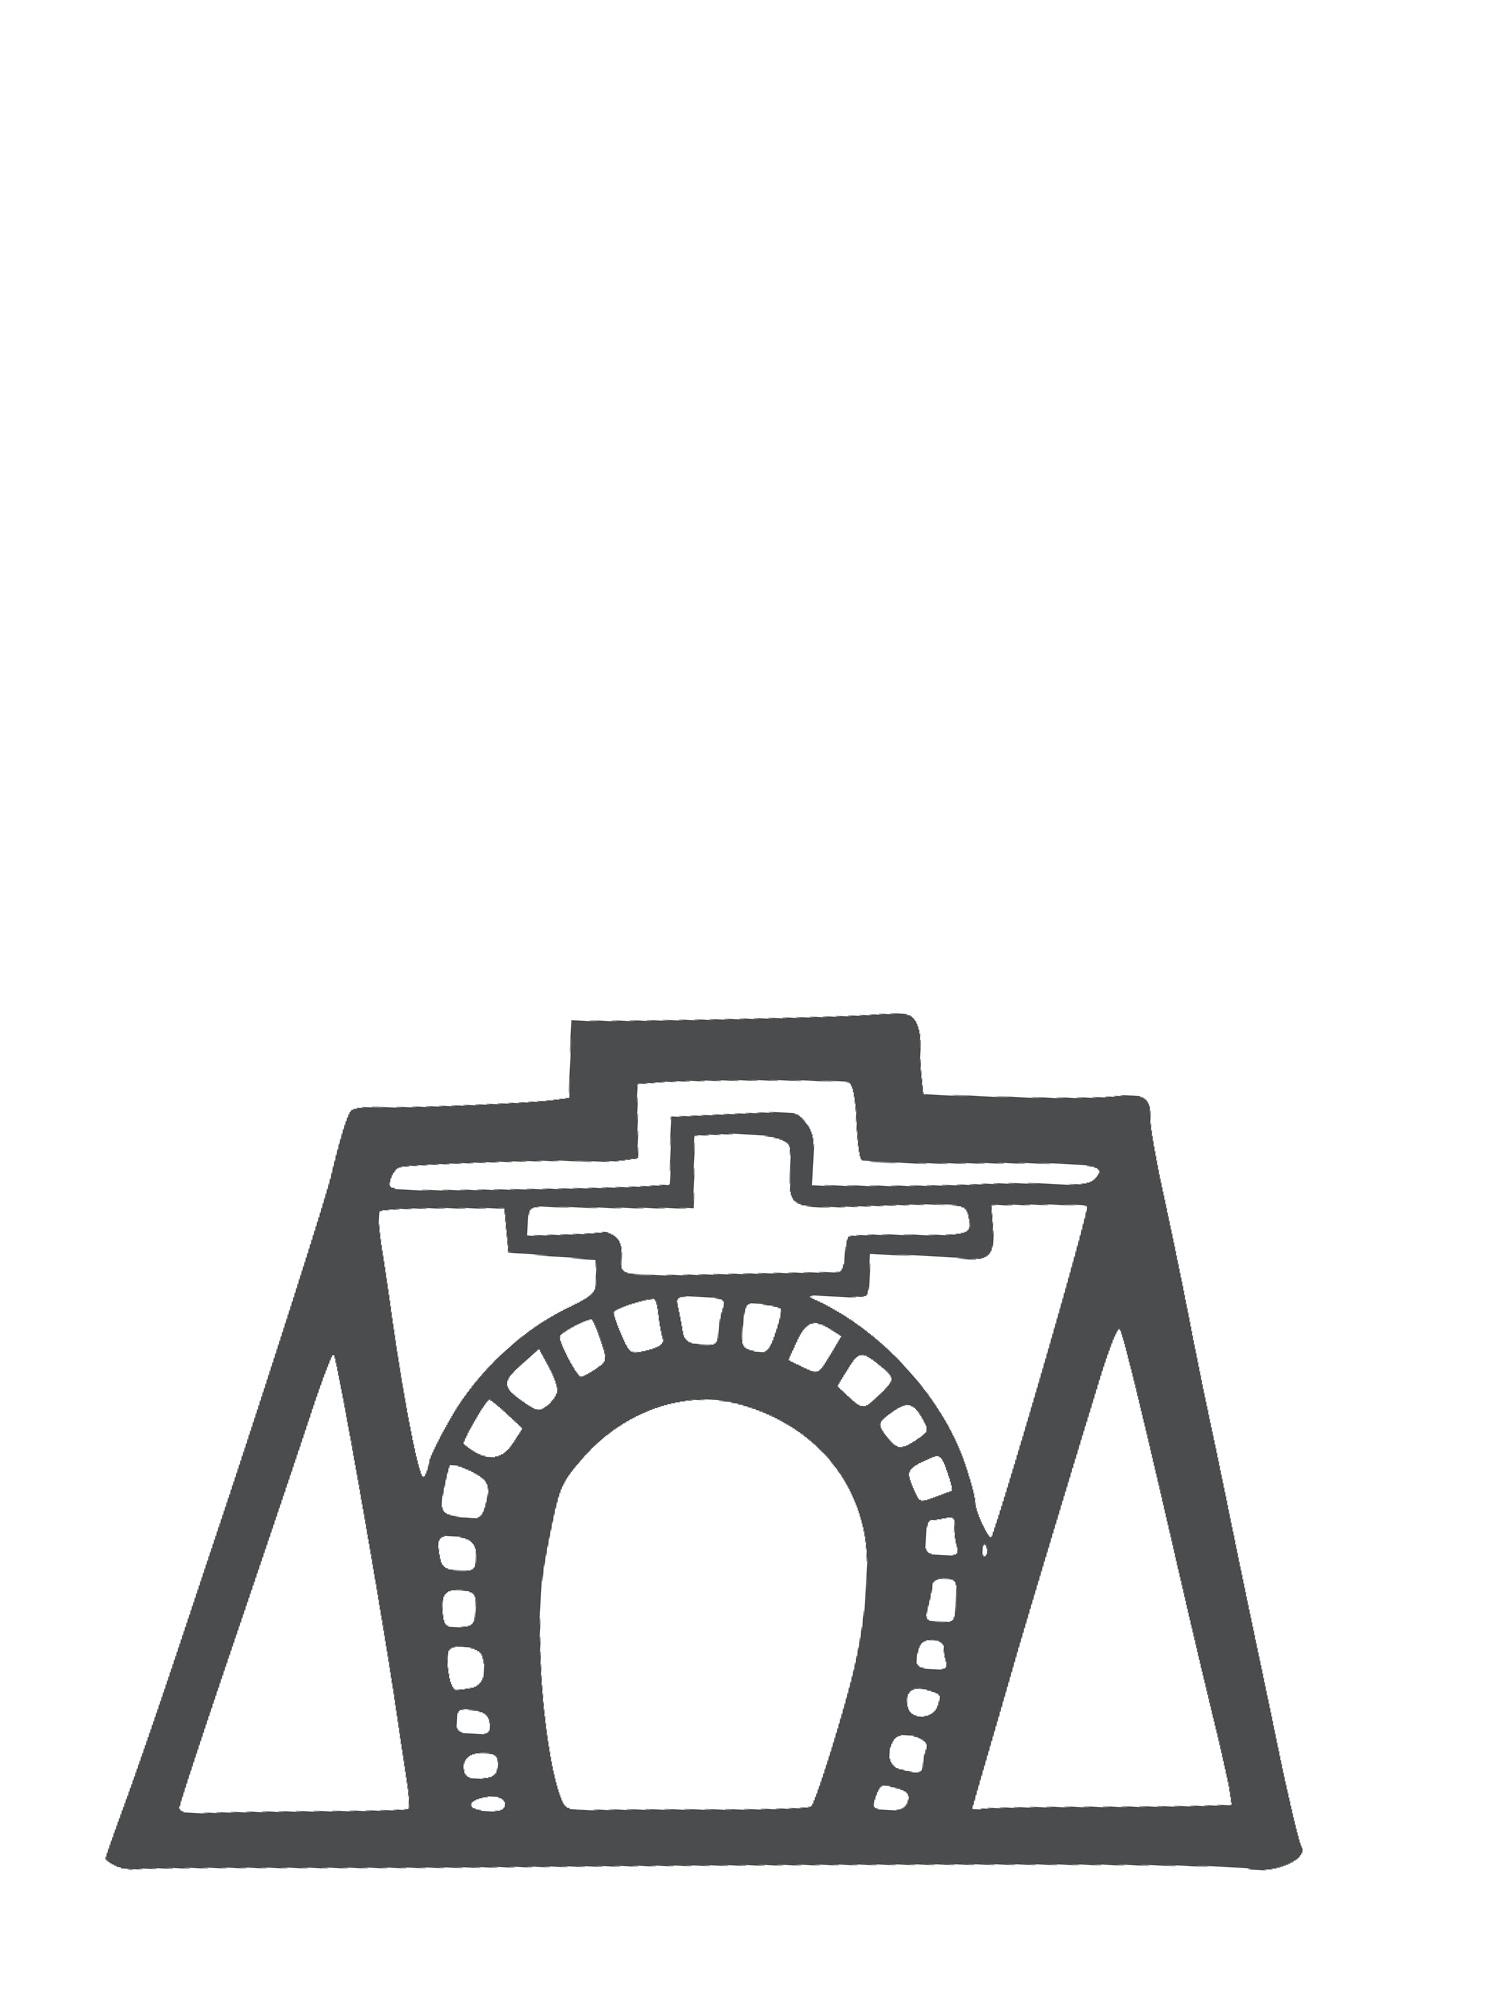 BRALSKY_TUNEL_R.NEMEC_mala_standart